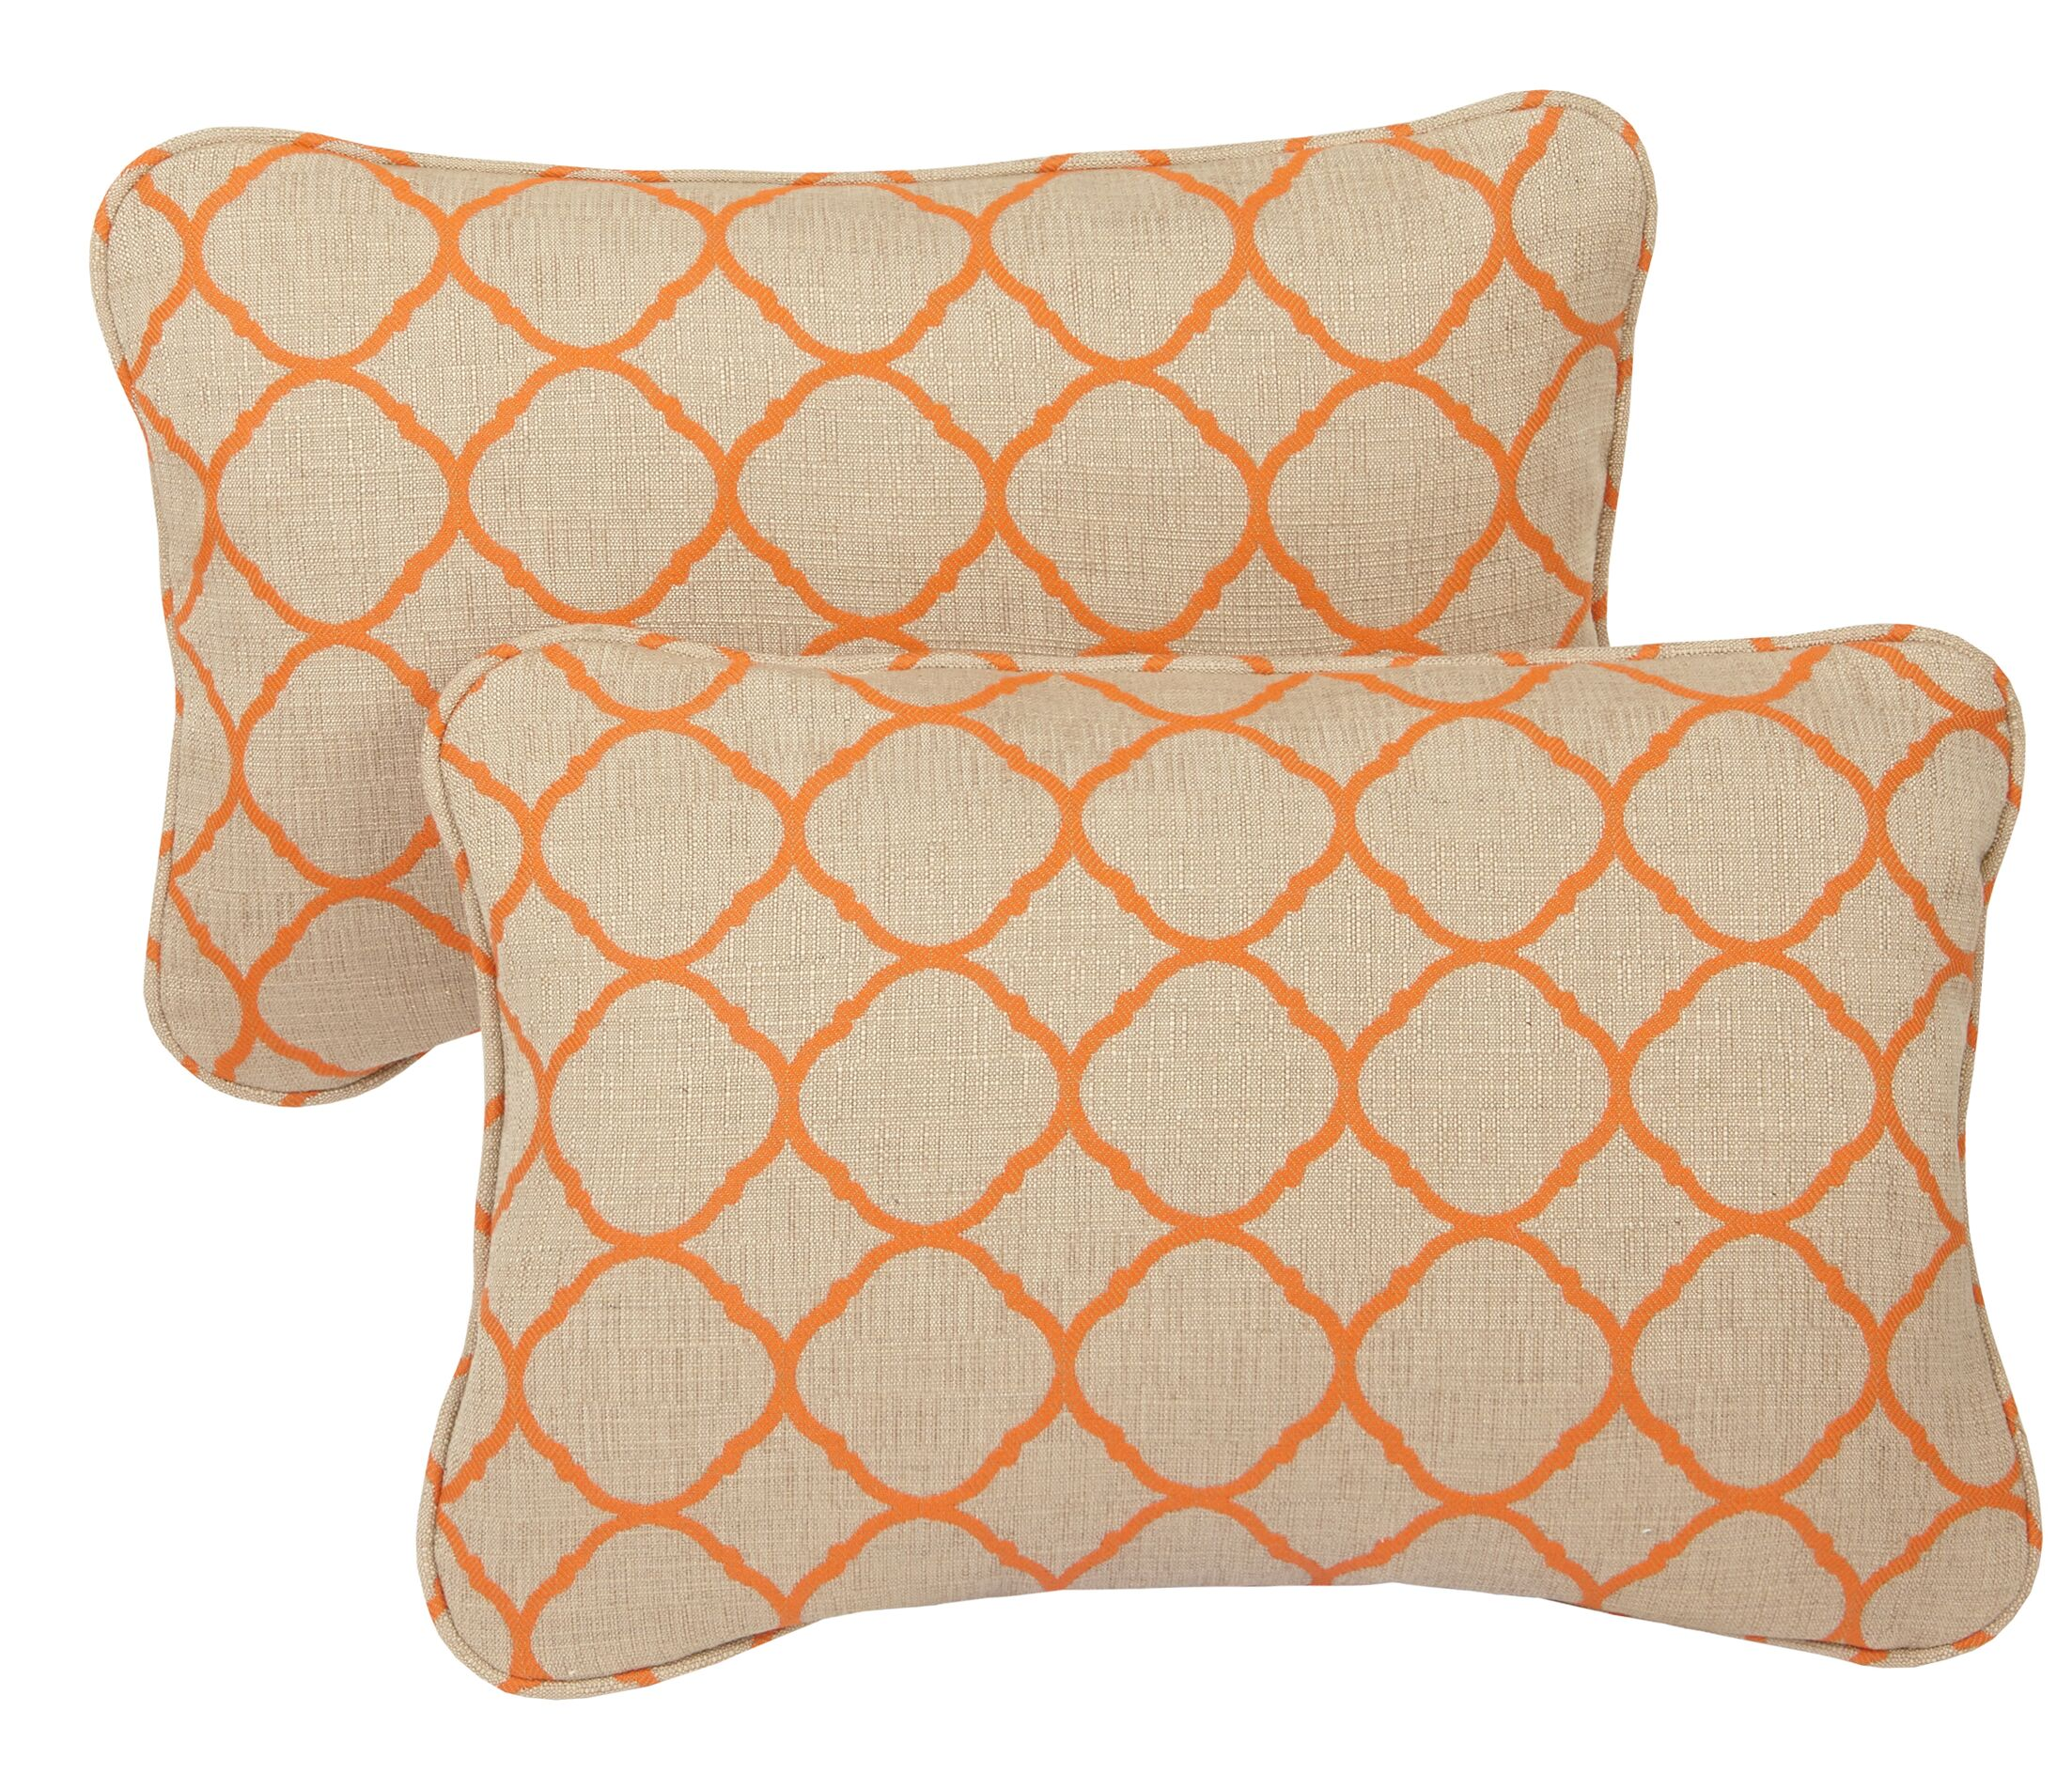 Topps Outdoor Sunbrella Lumbar Pillow Size: 13